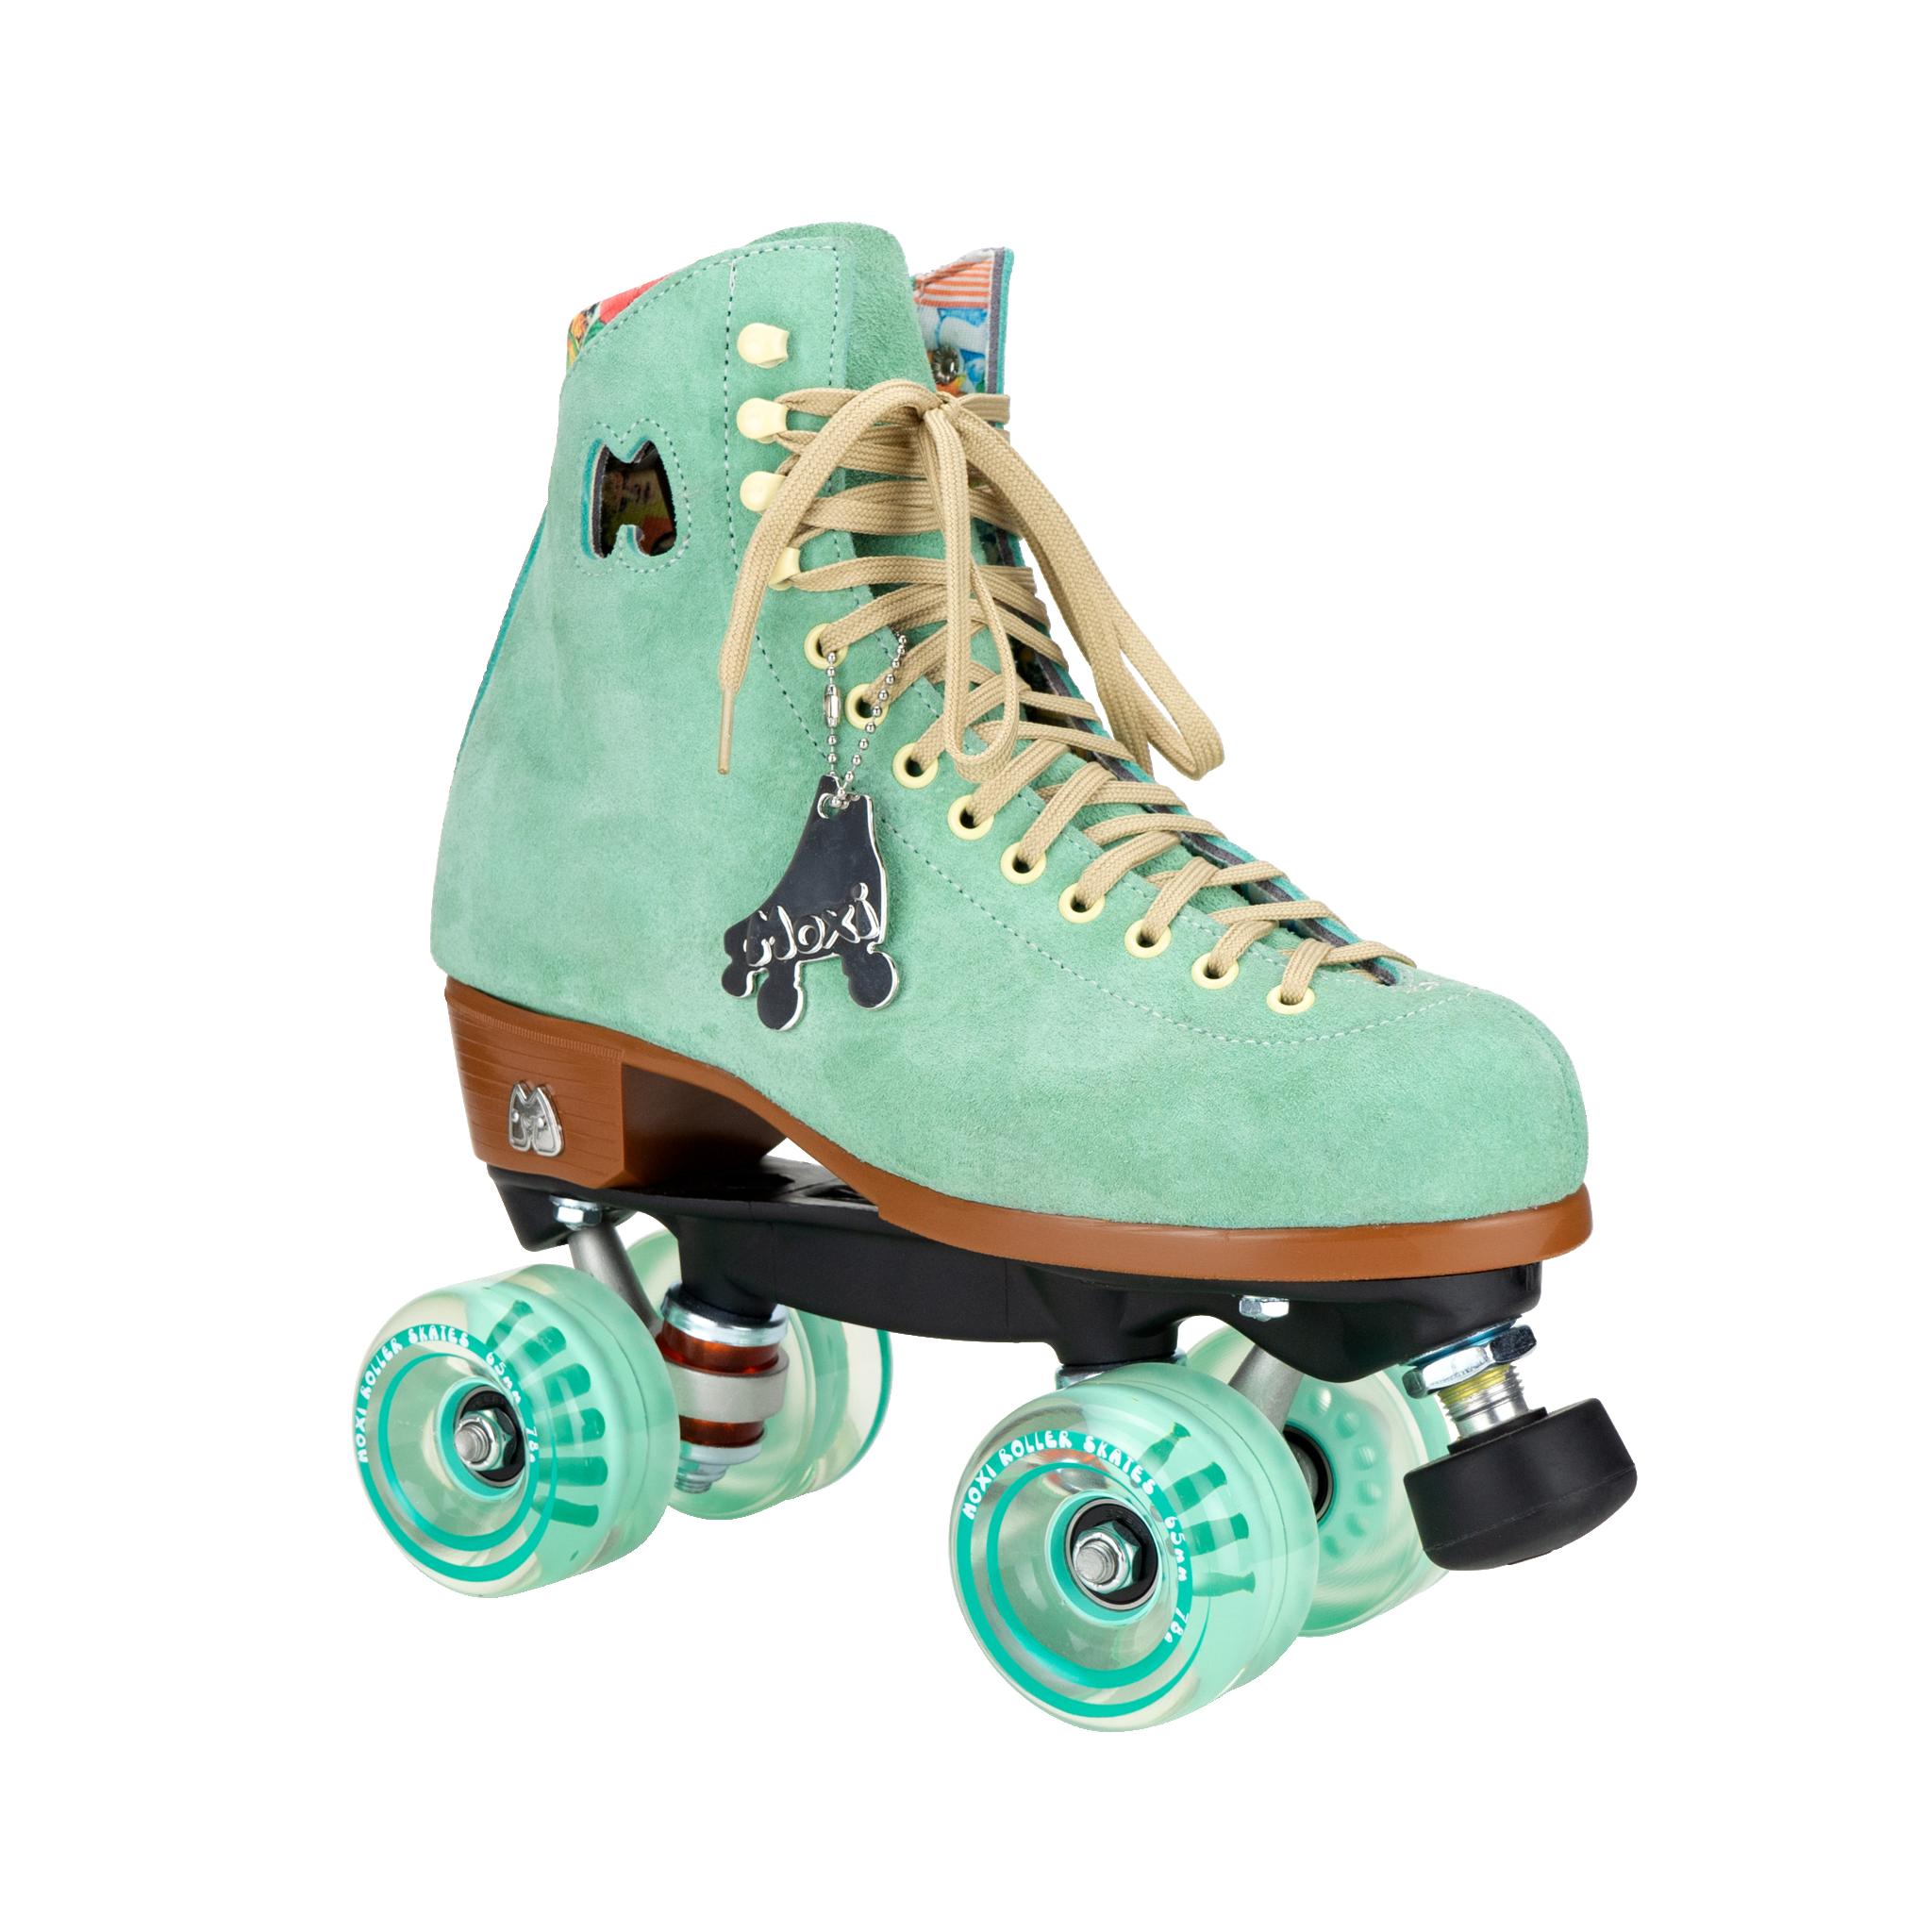 Moxi Lolly Skates Floss Teal